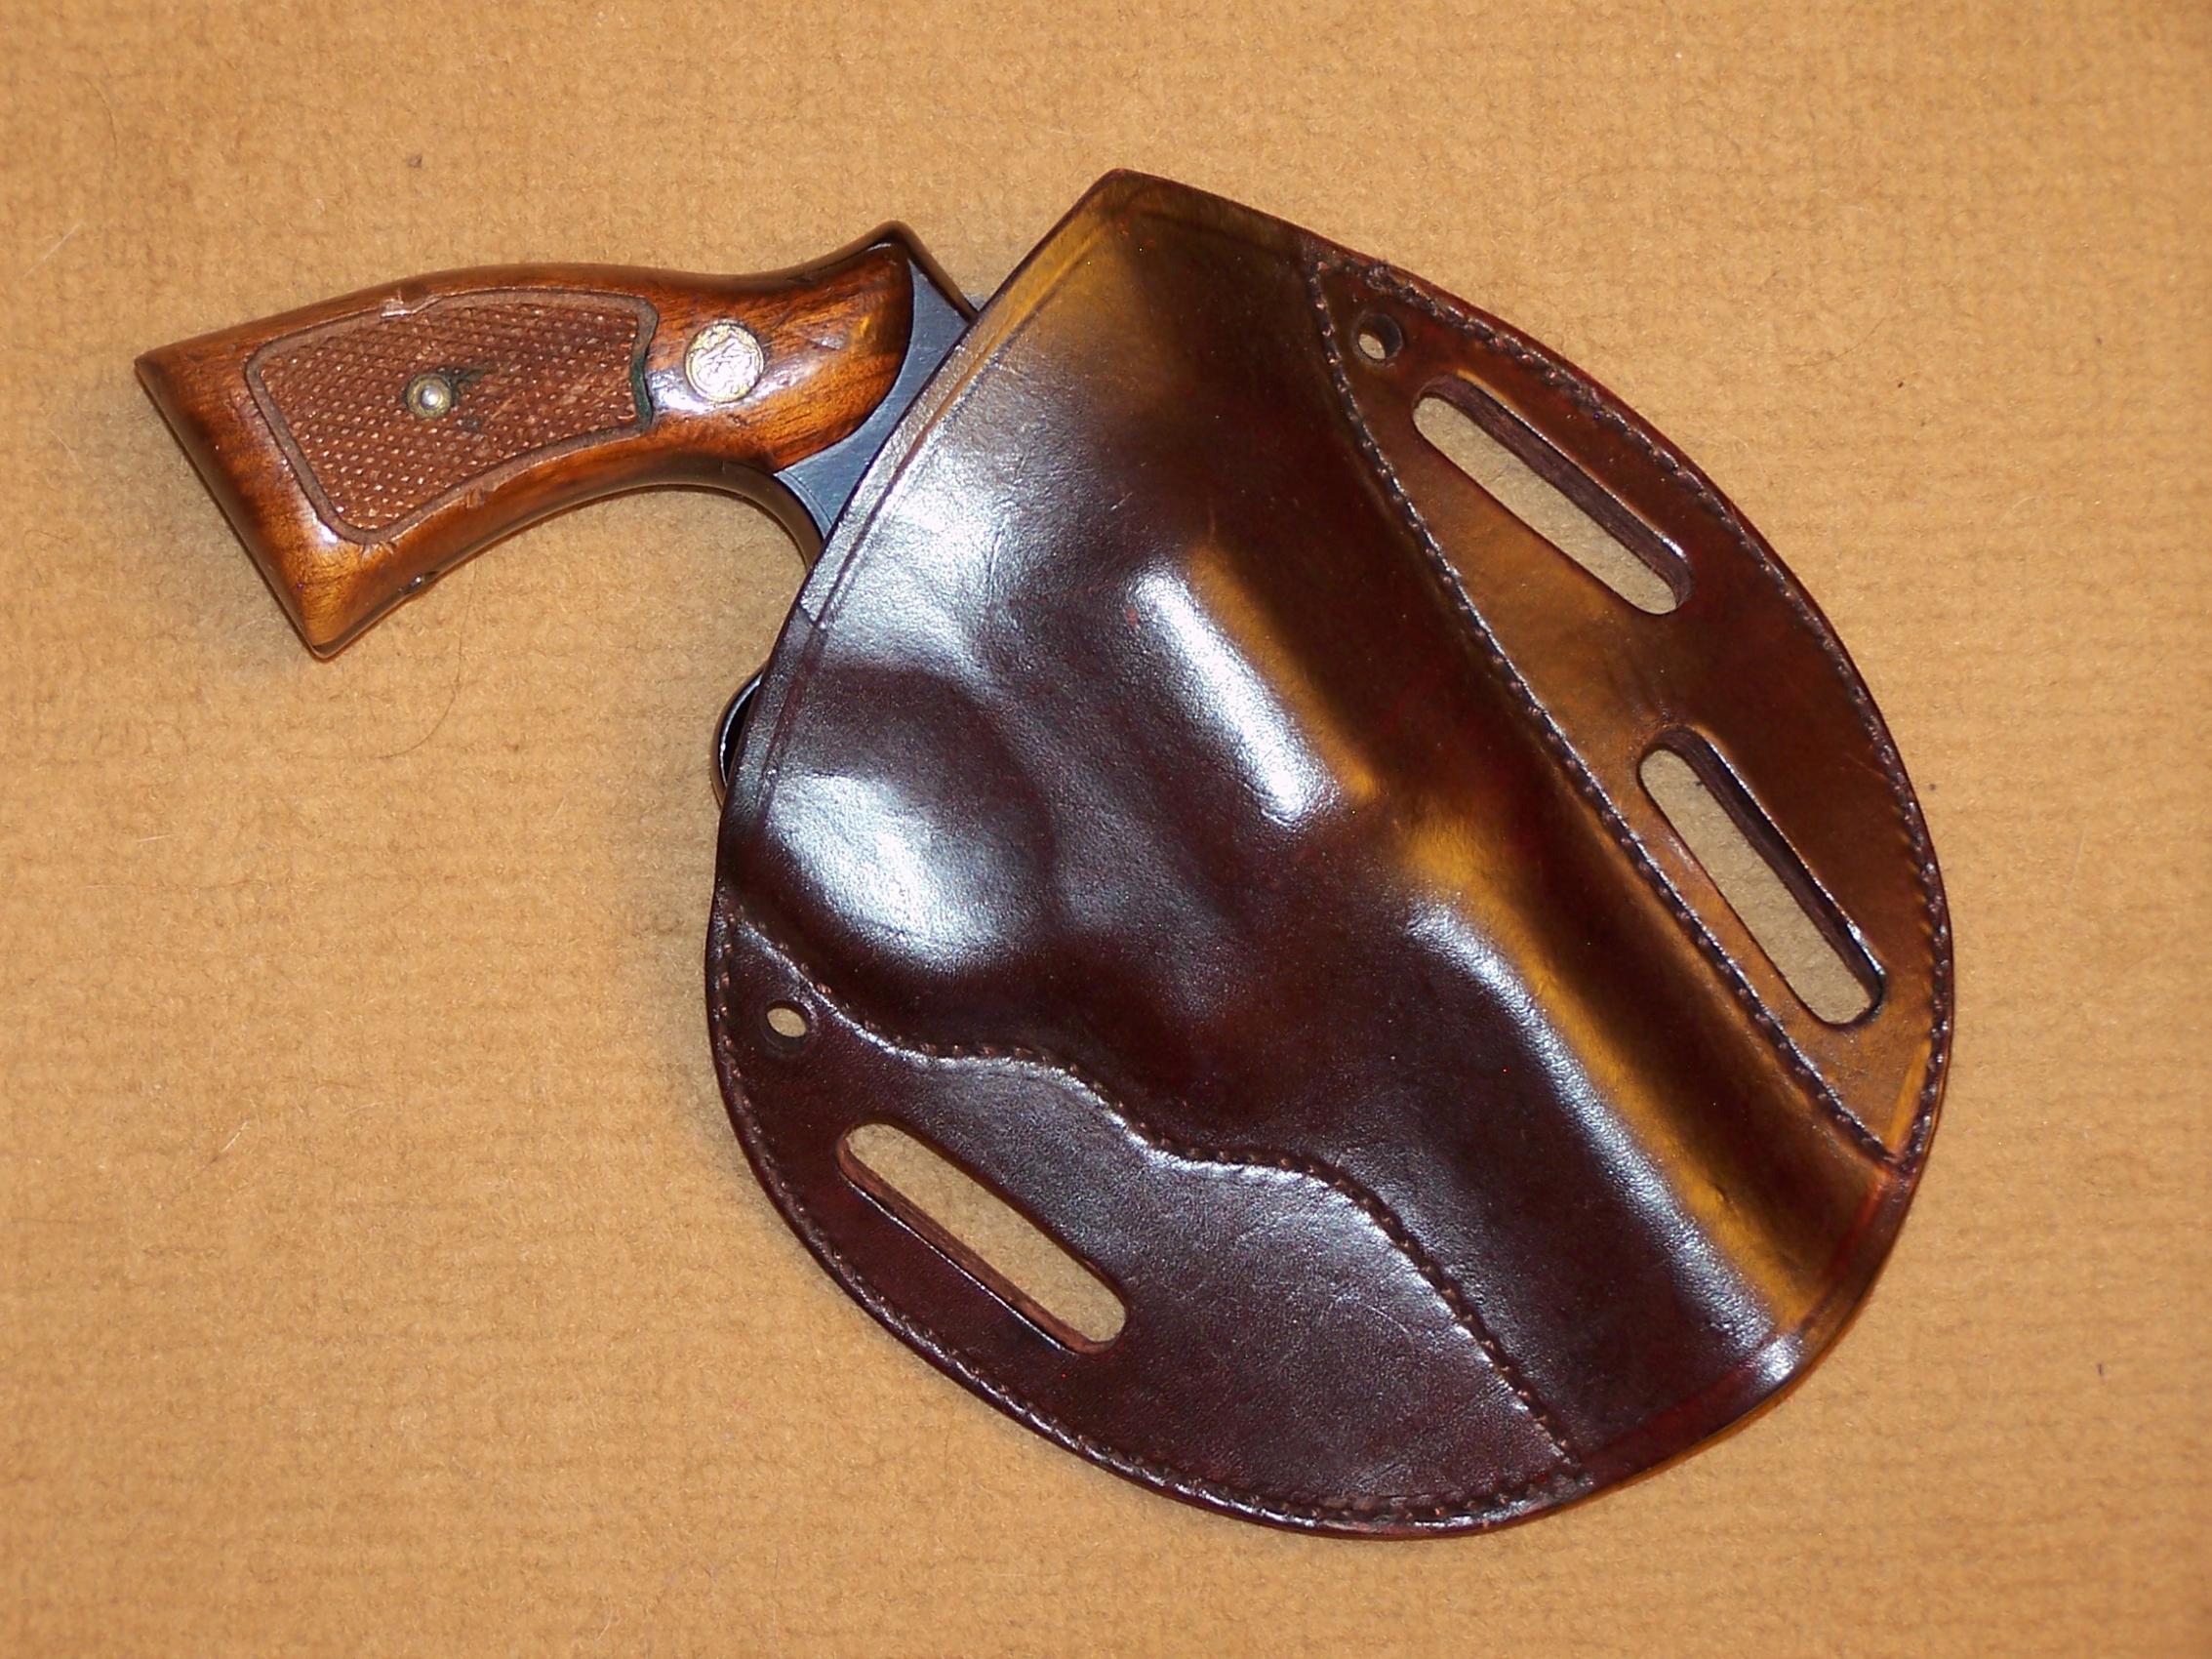 Belt holsters for a revolver?-013.jpg